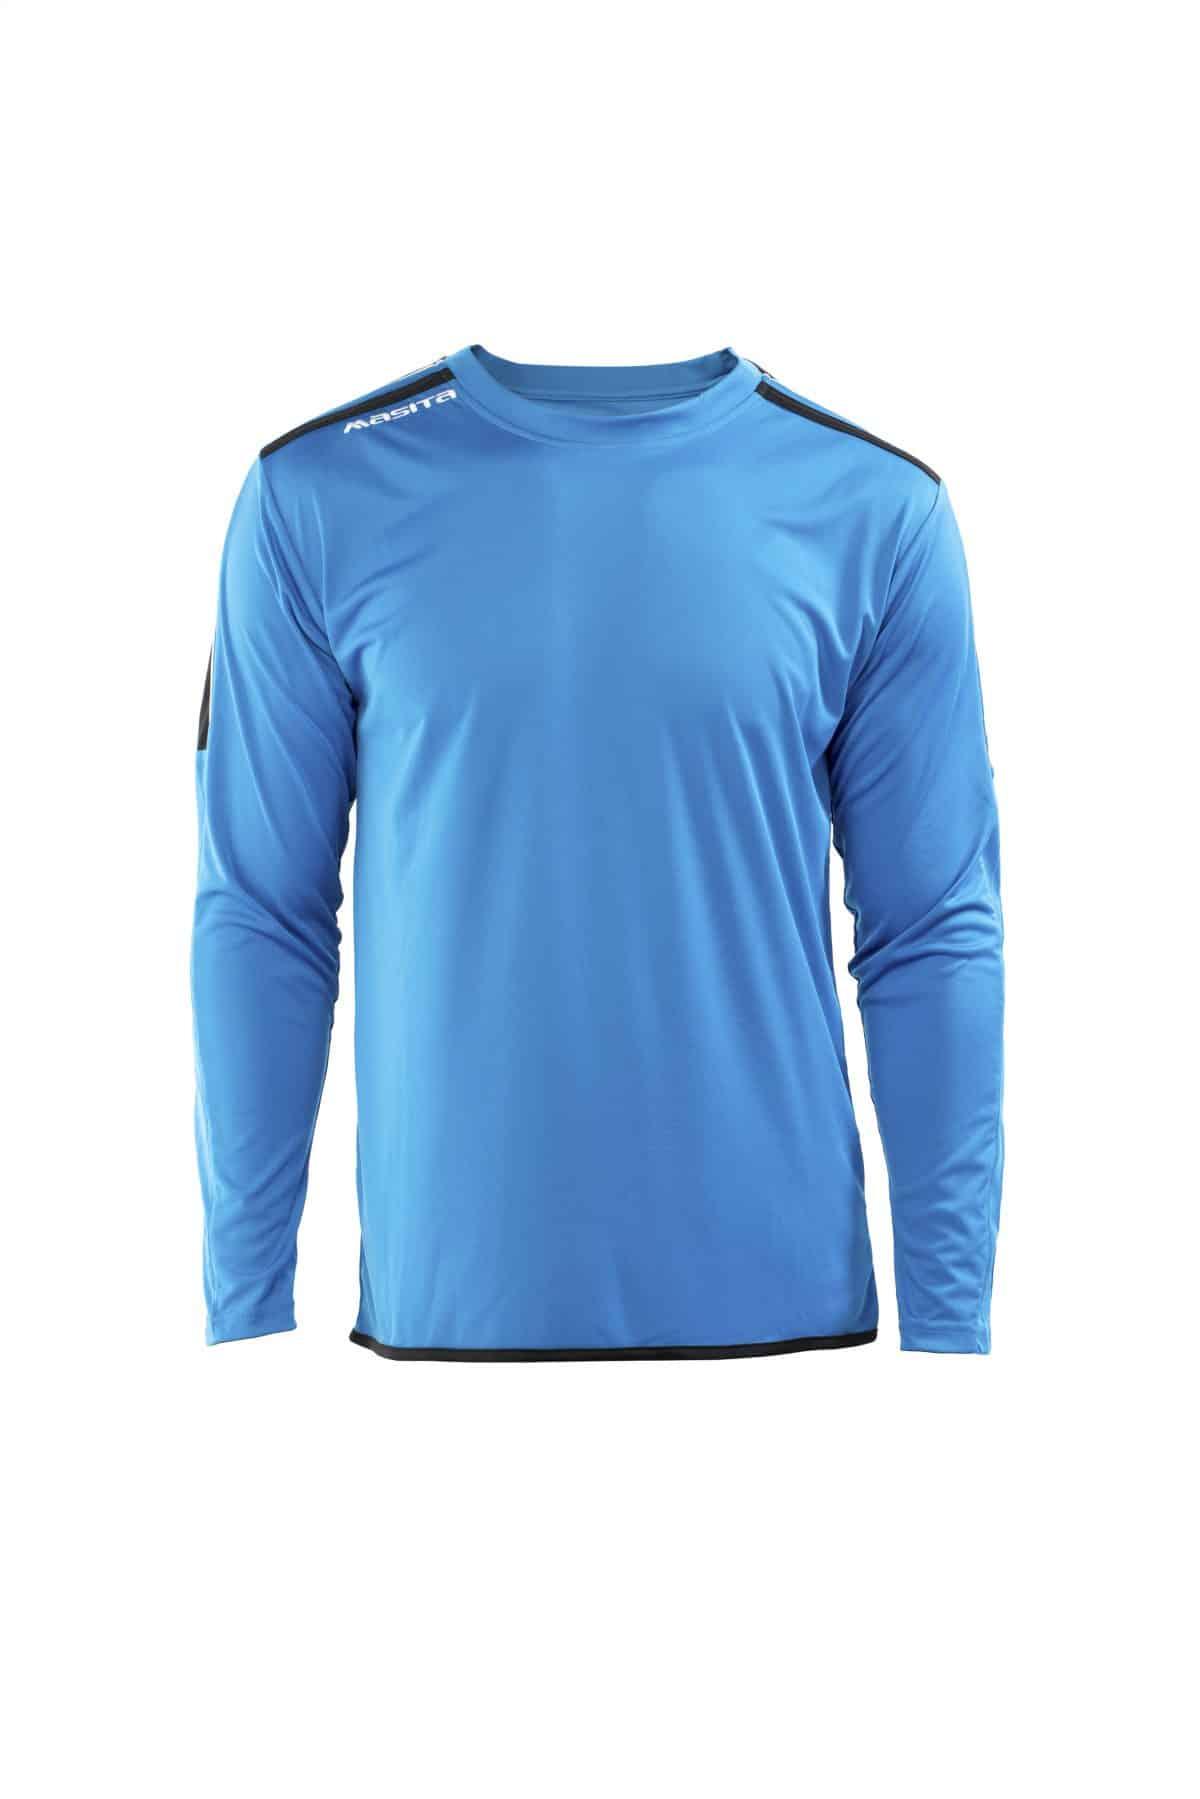 keepersshirt.masita.blauw.